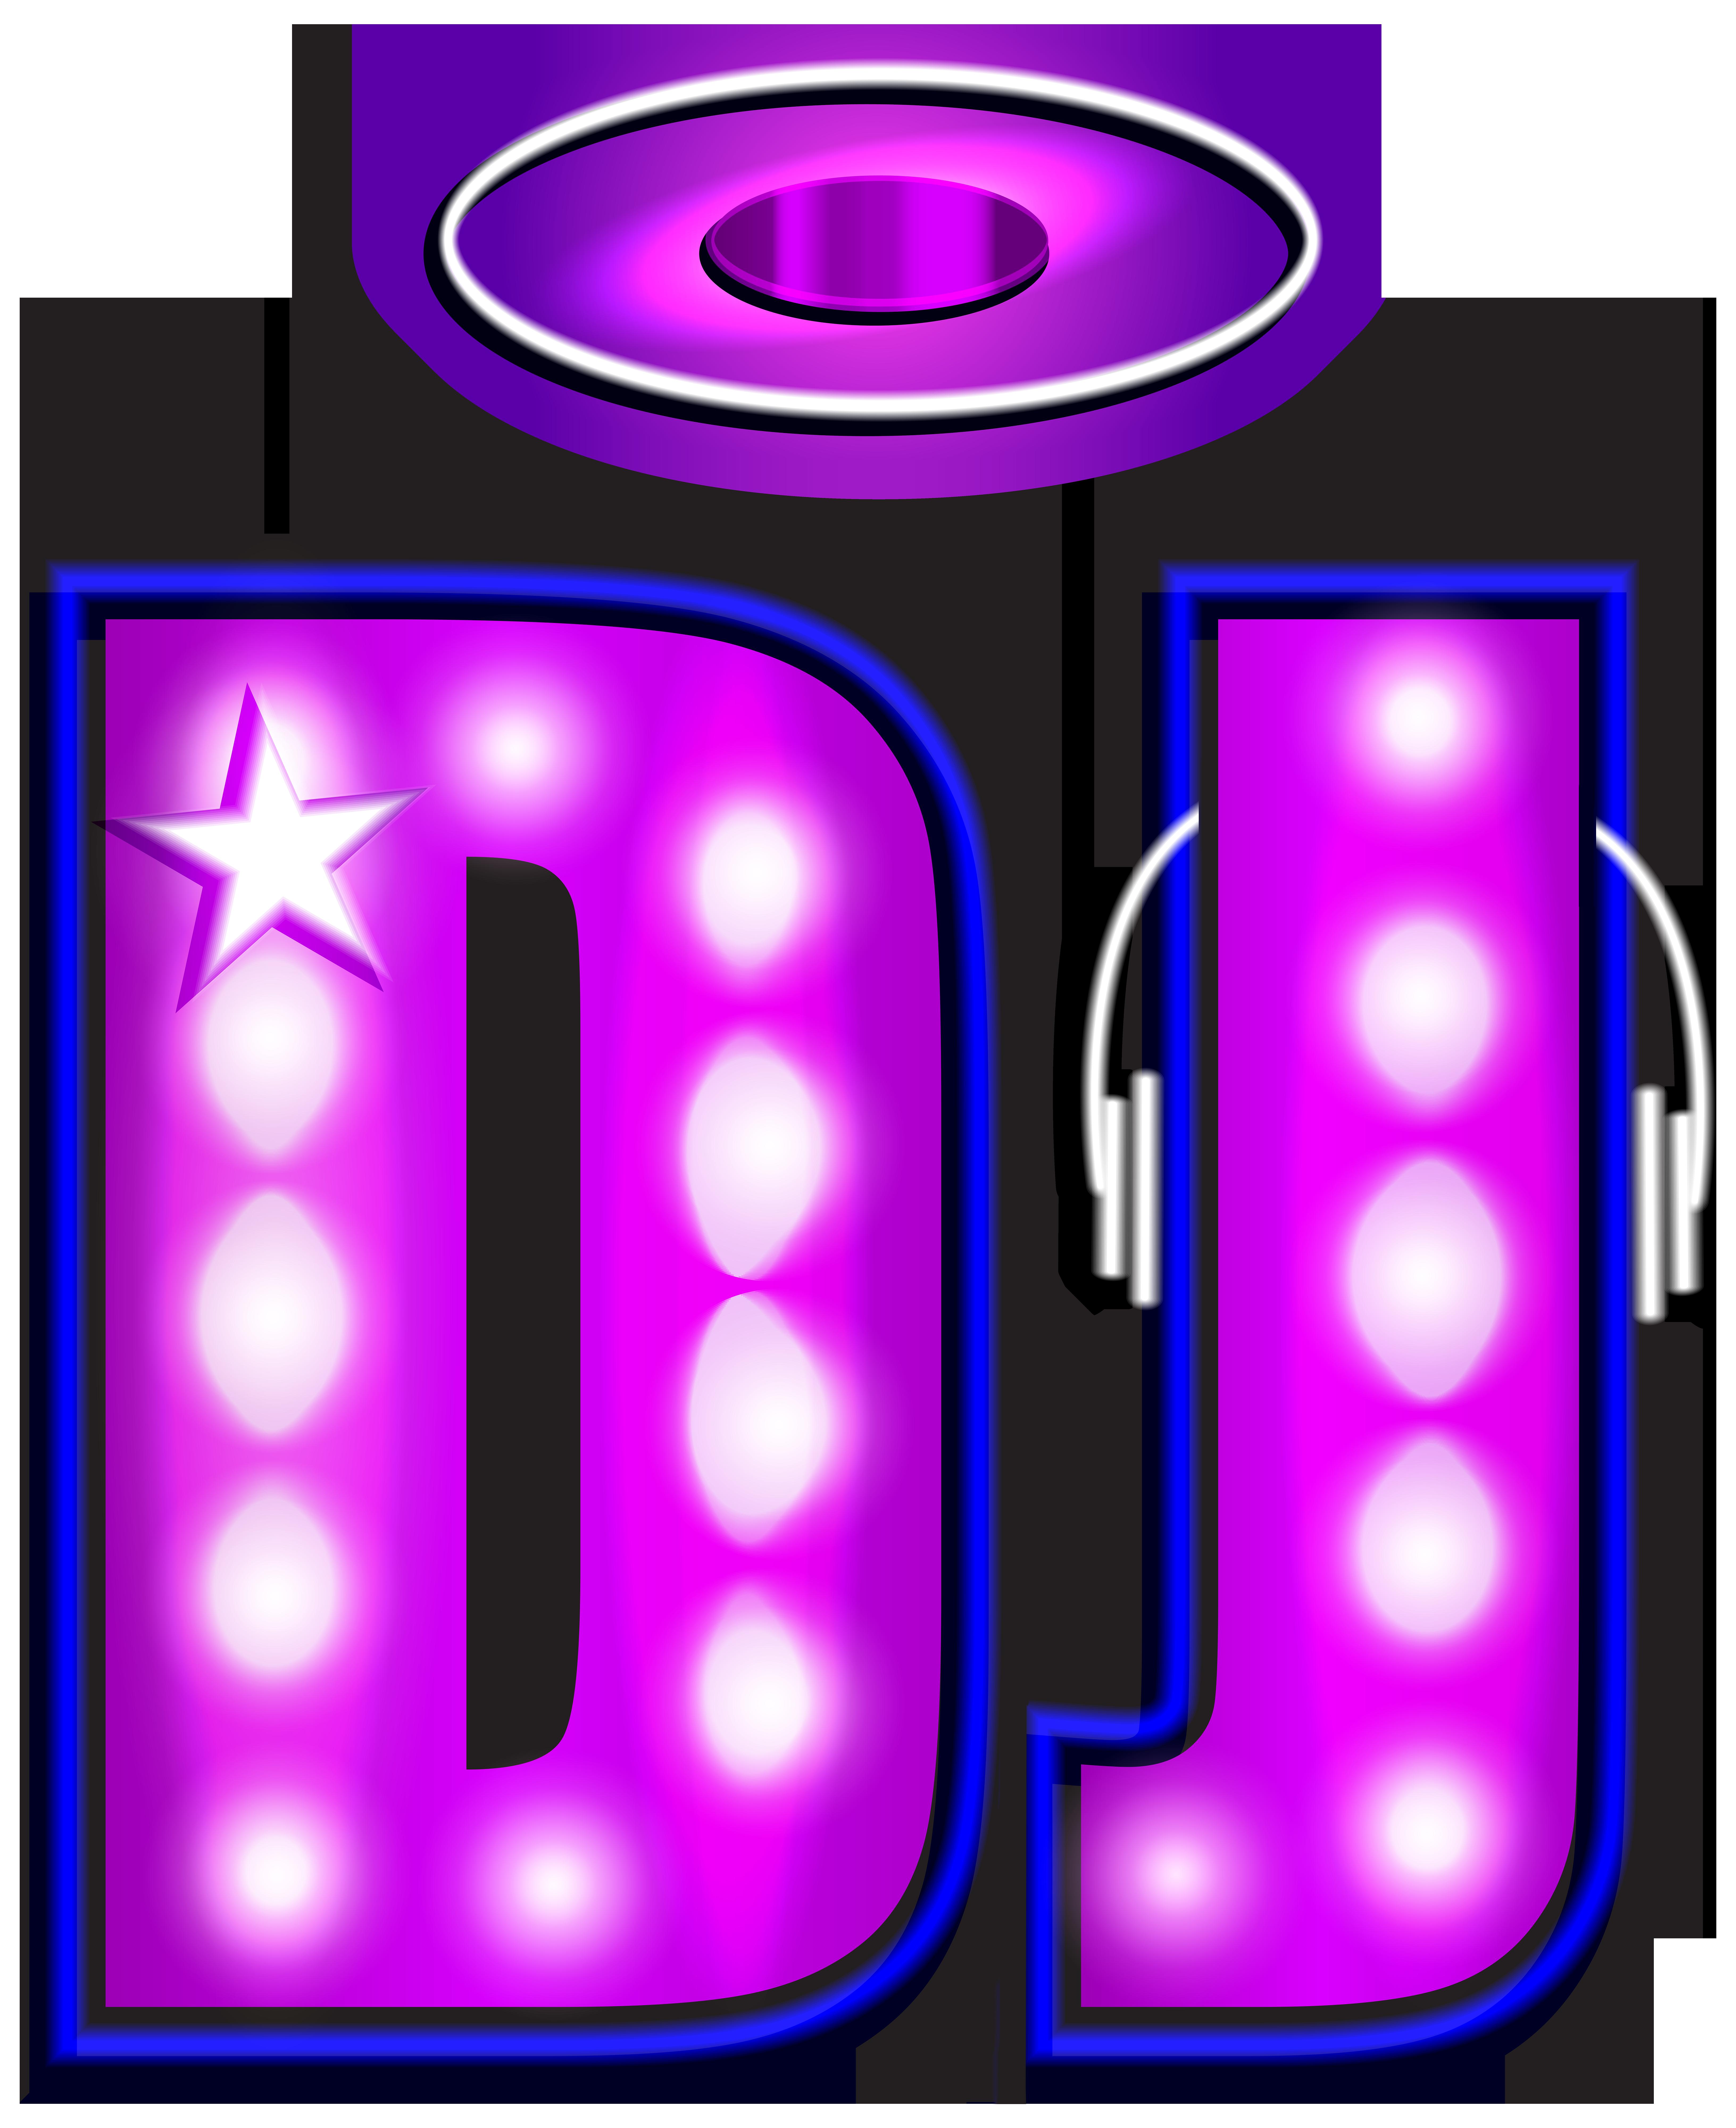 Dj Png Free Download & Free Dj Download.png Transparent Images.